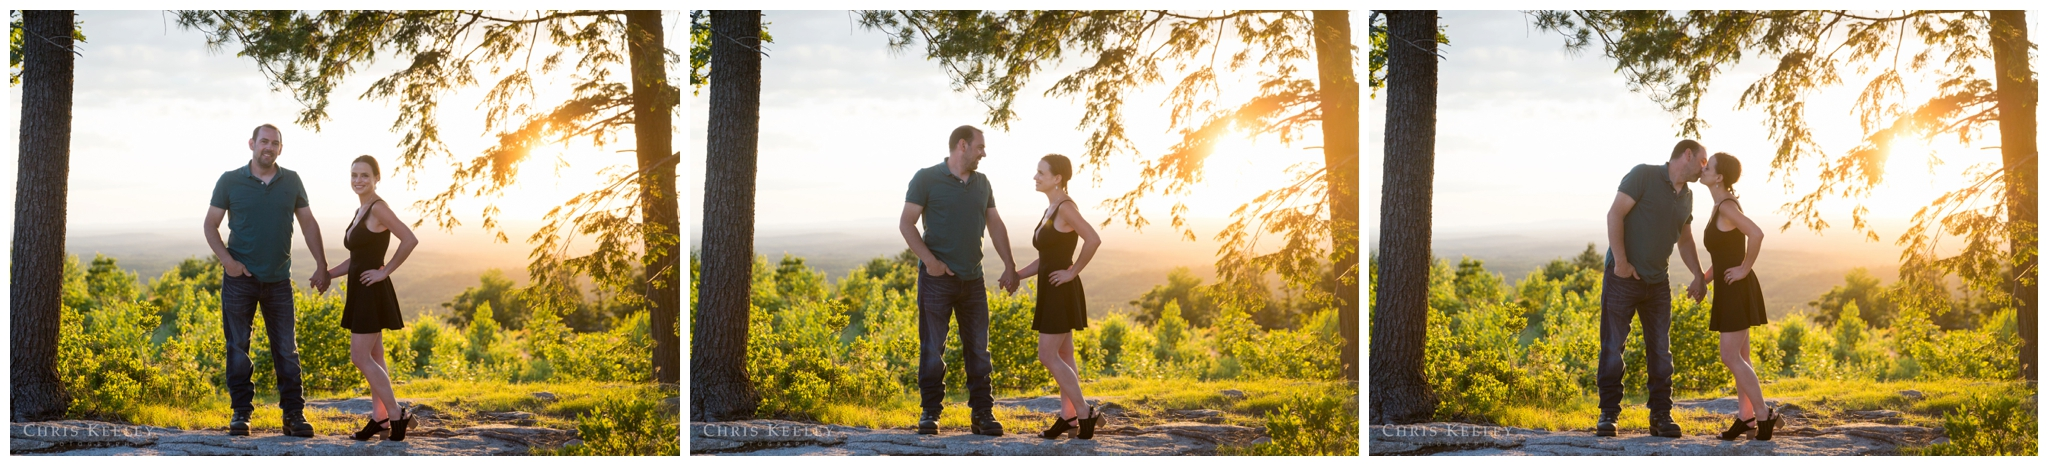 wedding-photographer-dover-new-hampshire-chris-keeley-photography-03.jpg